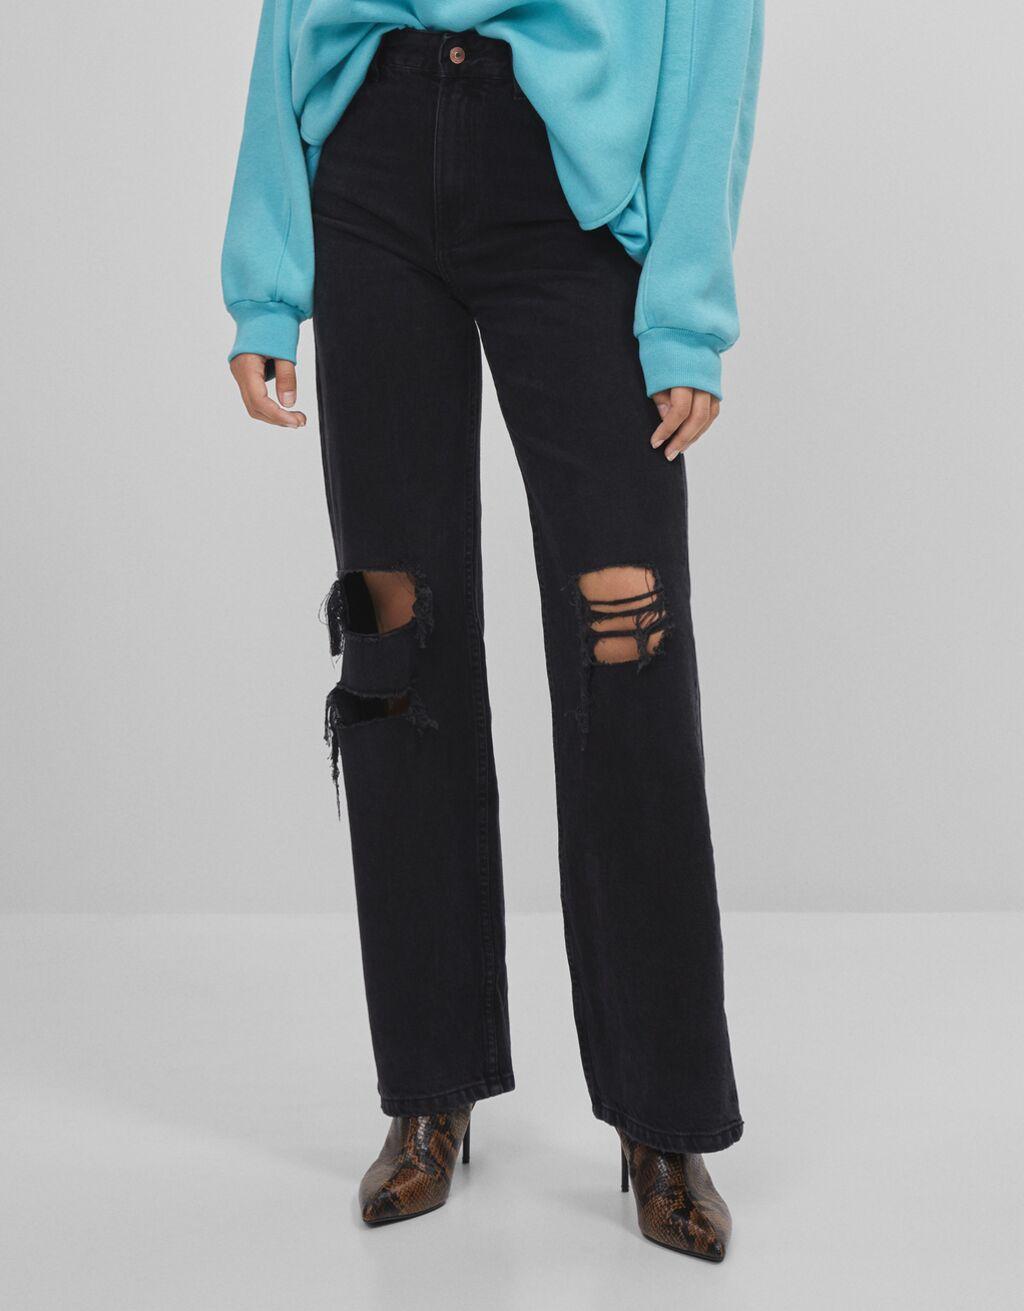 Jeans 90's Flare con rotos